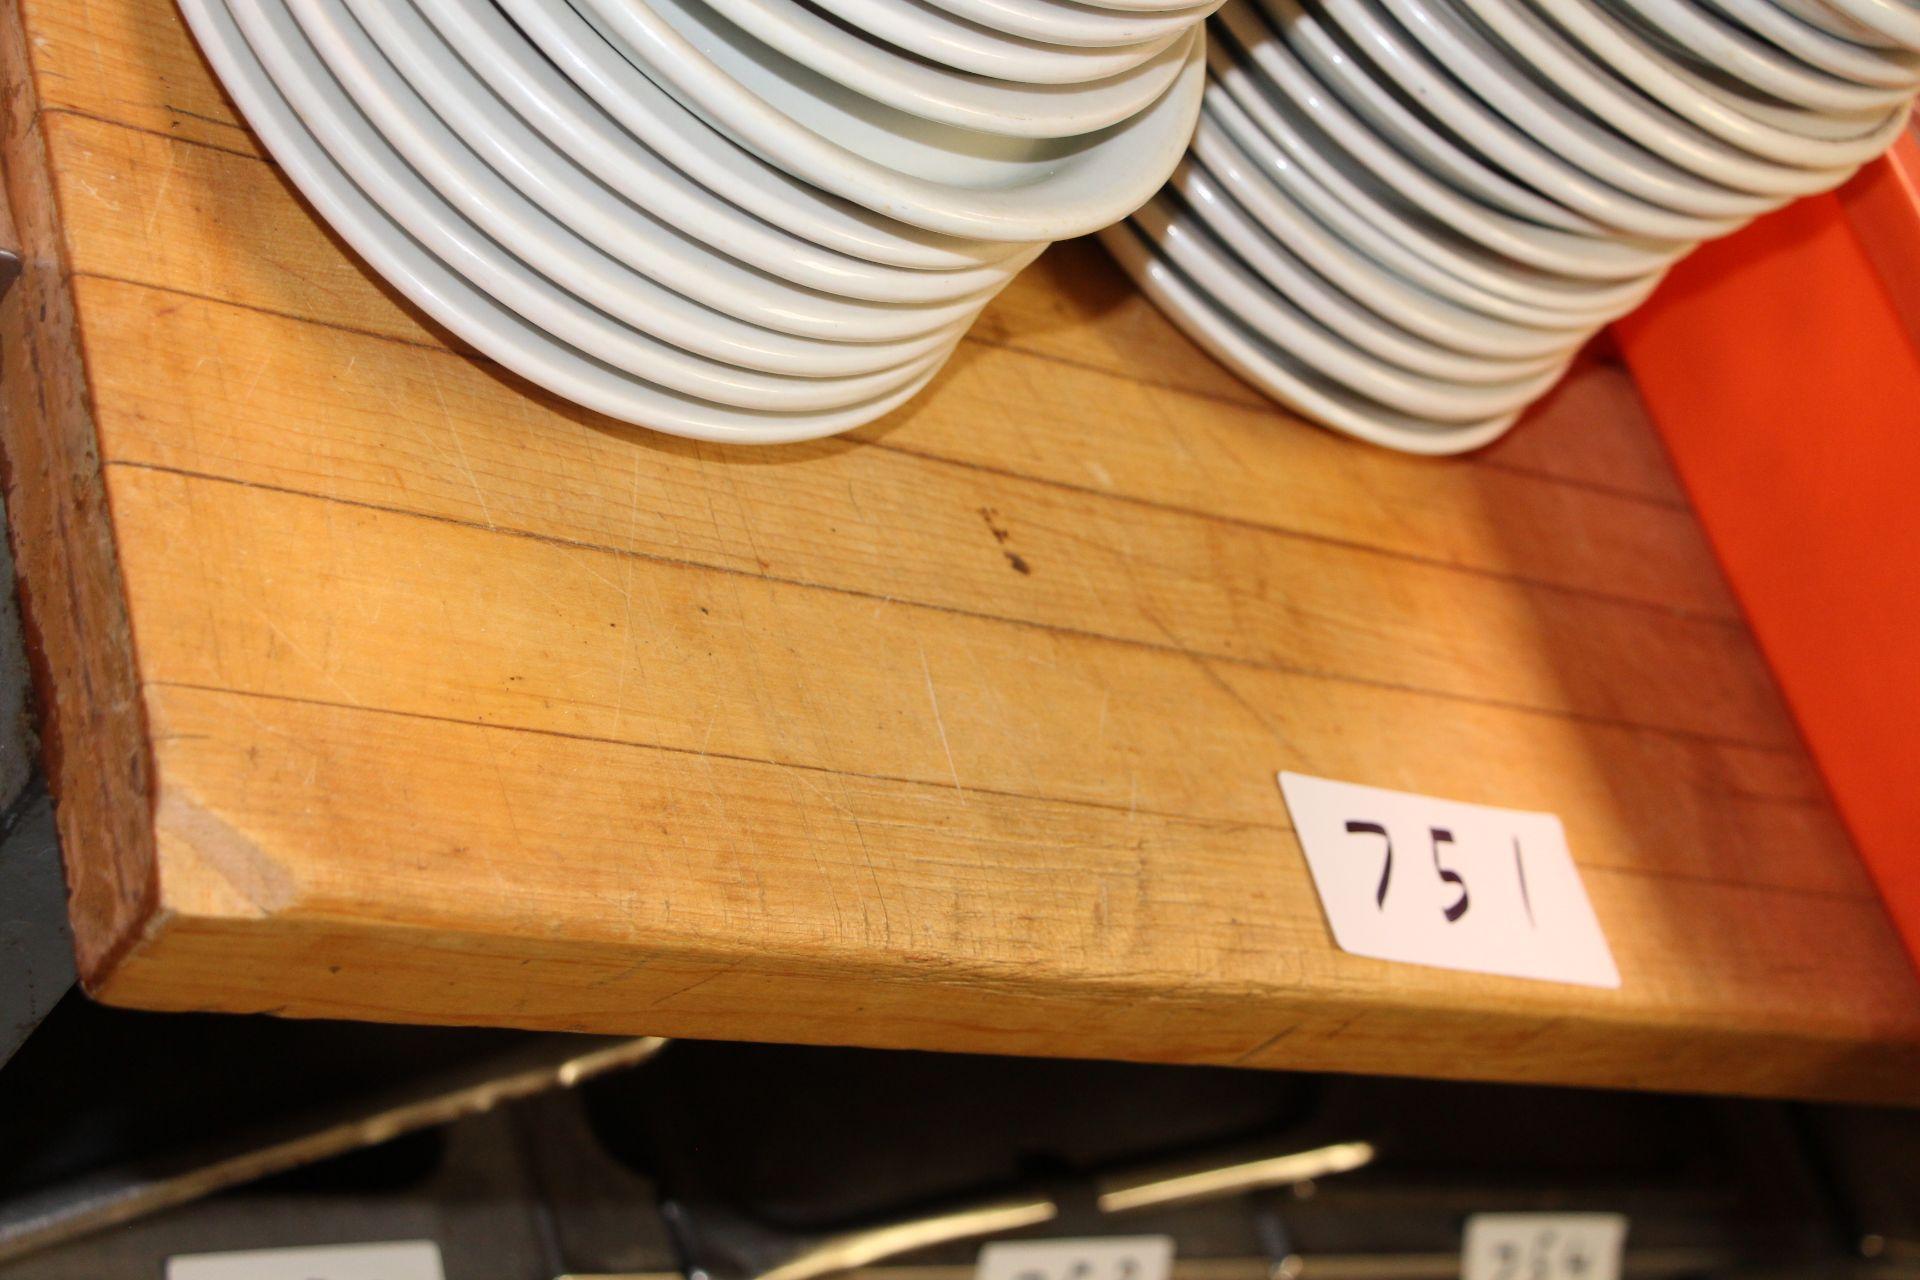 Lot 751 - Butcher block top prep table